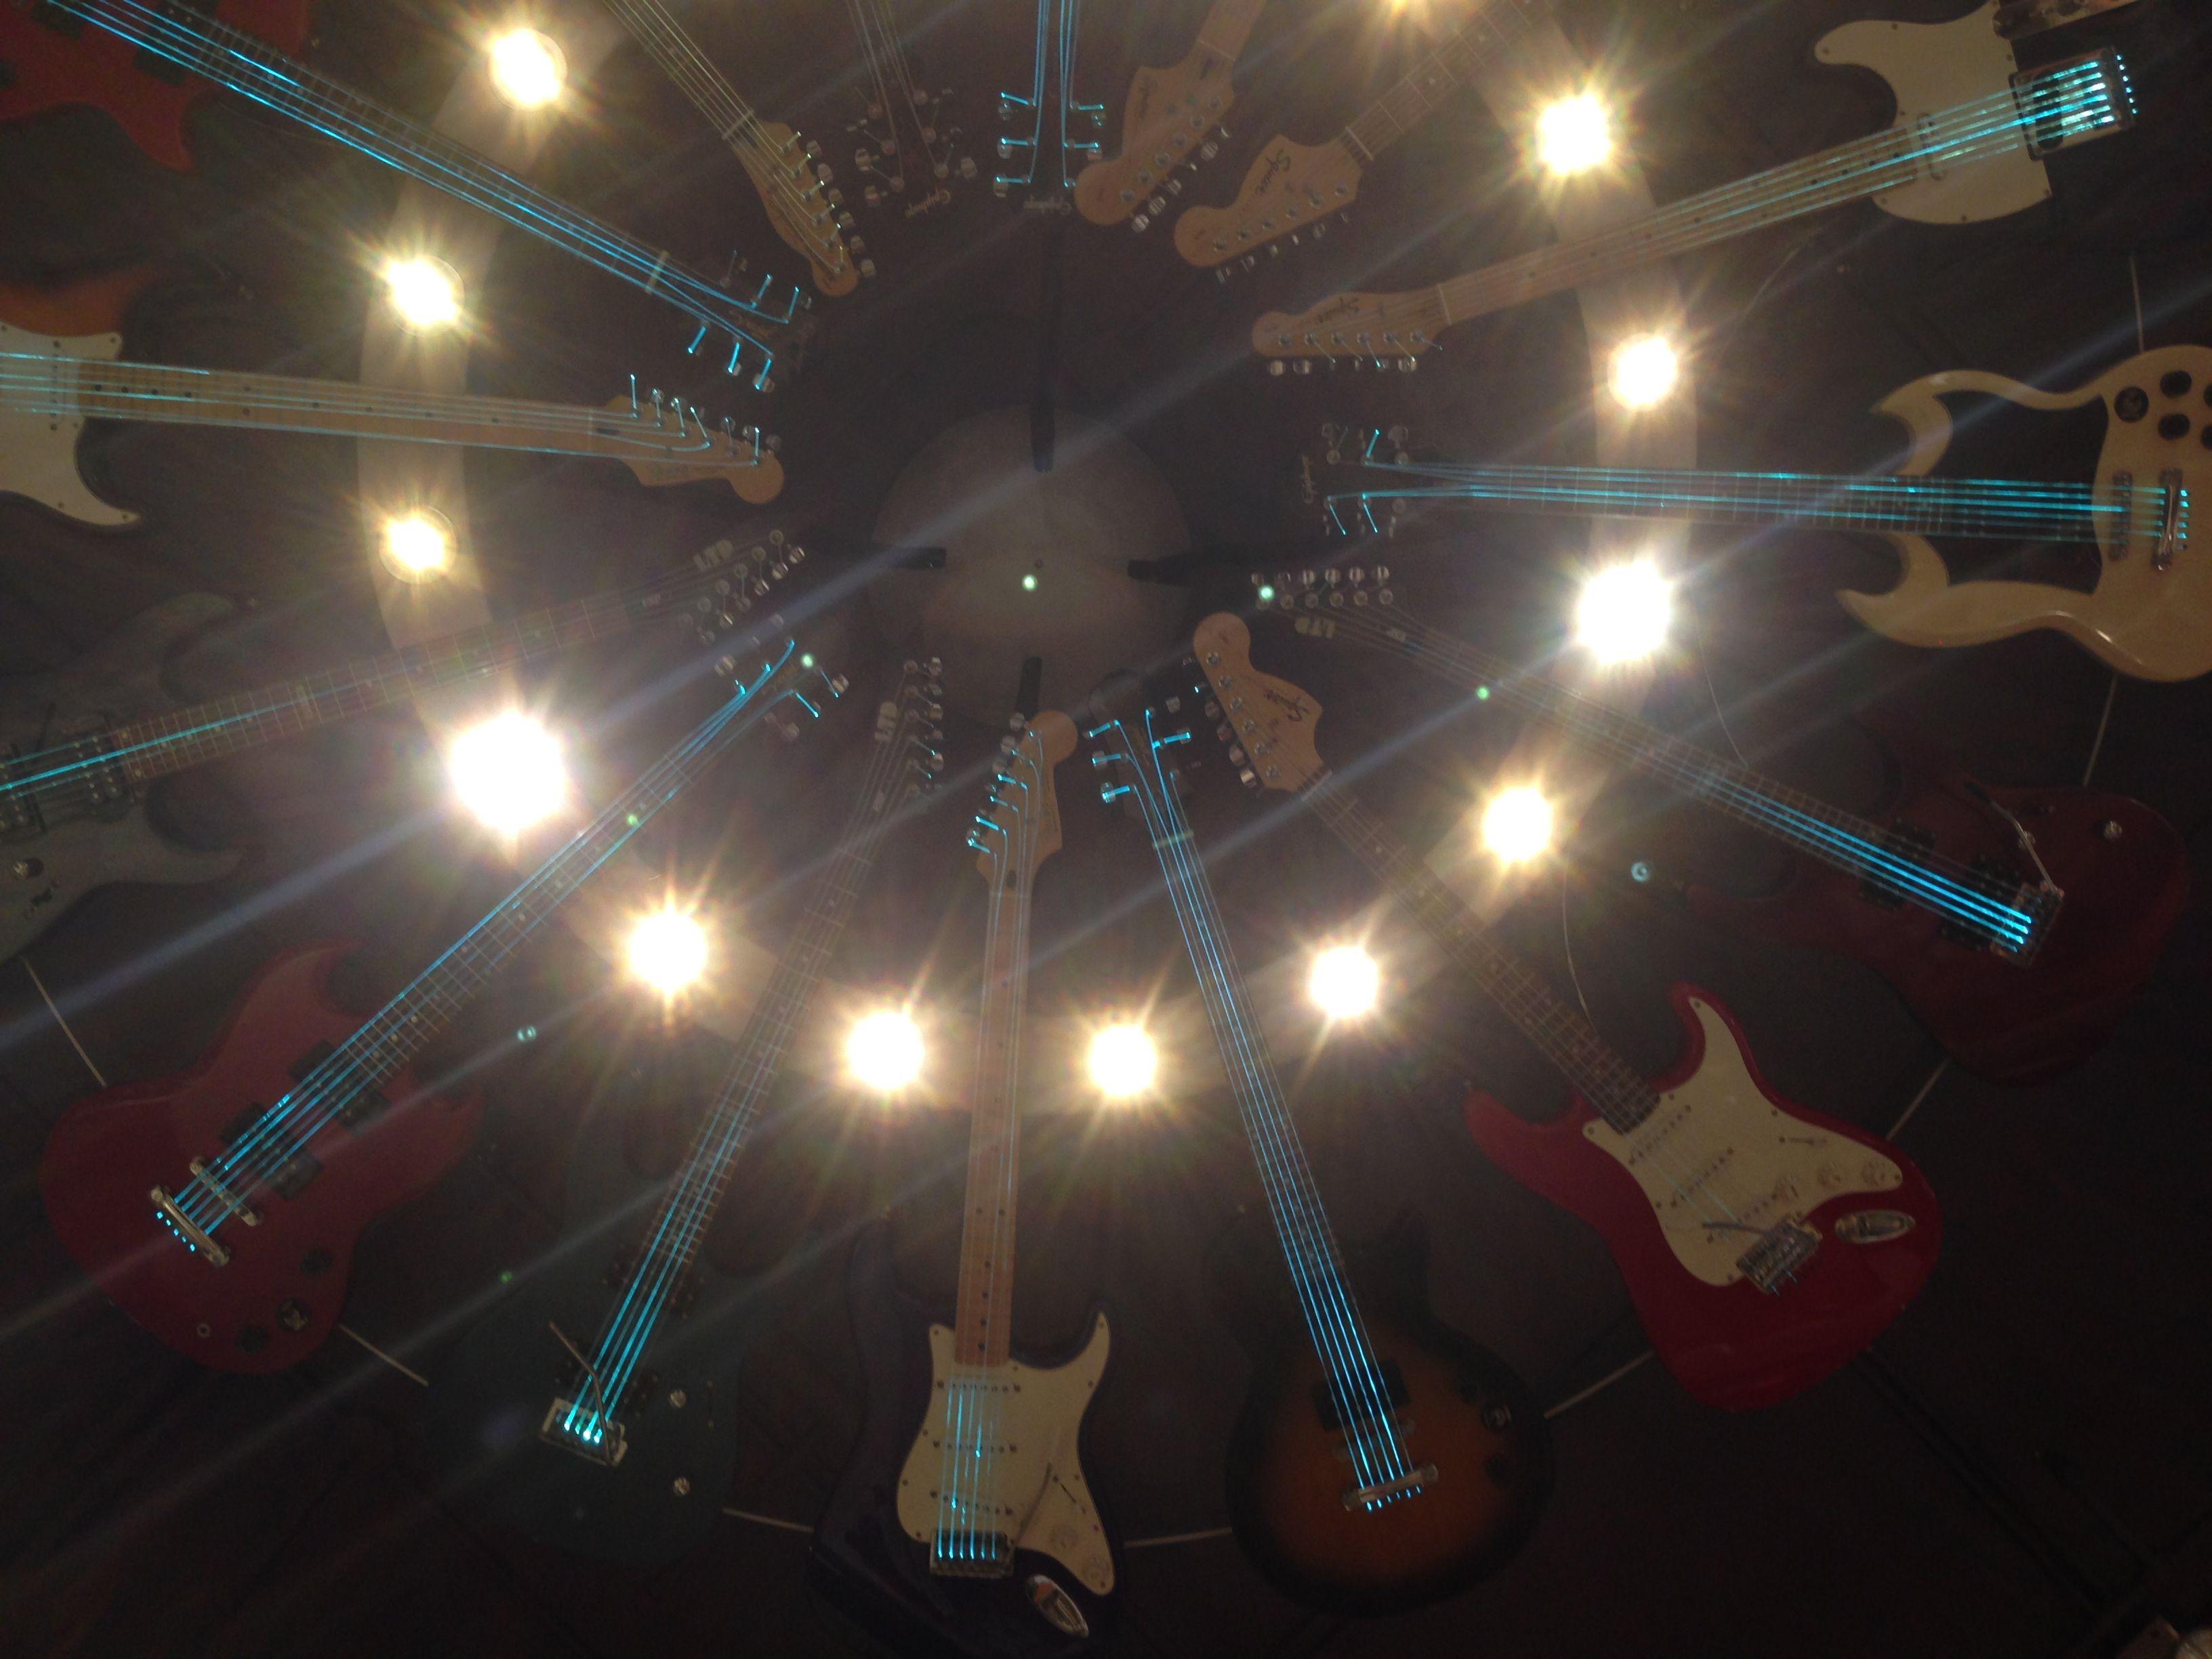 Fender guitar chandelier hard rock hotel universal studios orlando fender guitar chandelier hard rock hotel universal studios orlando fl usa arubaitofo Choice Image